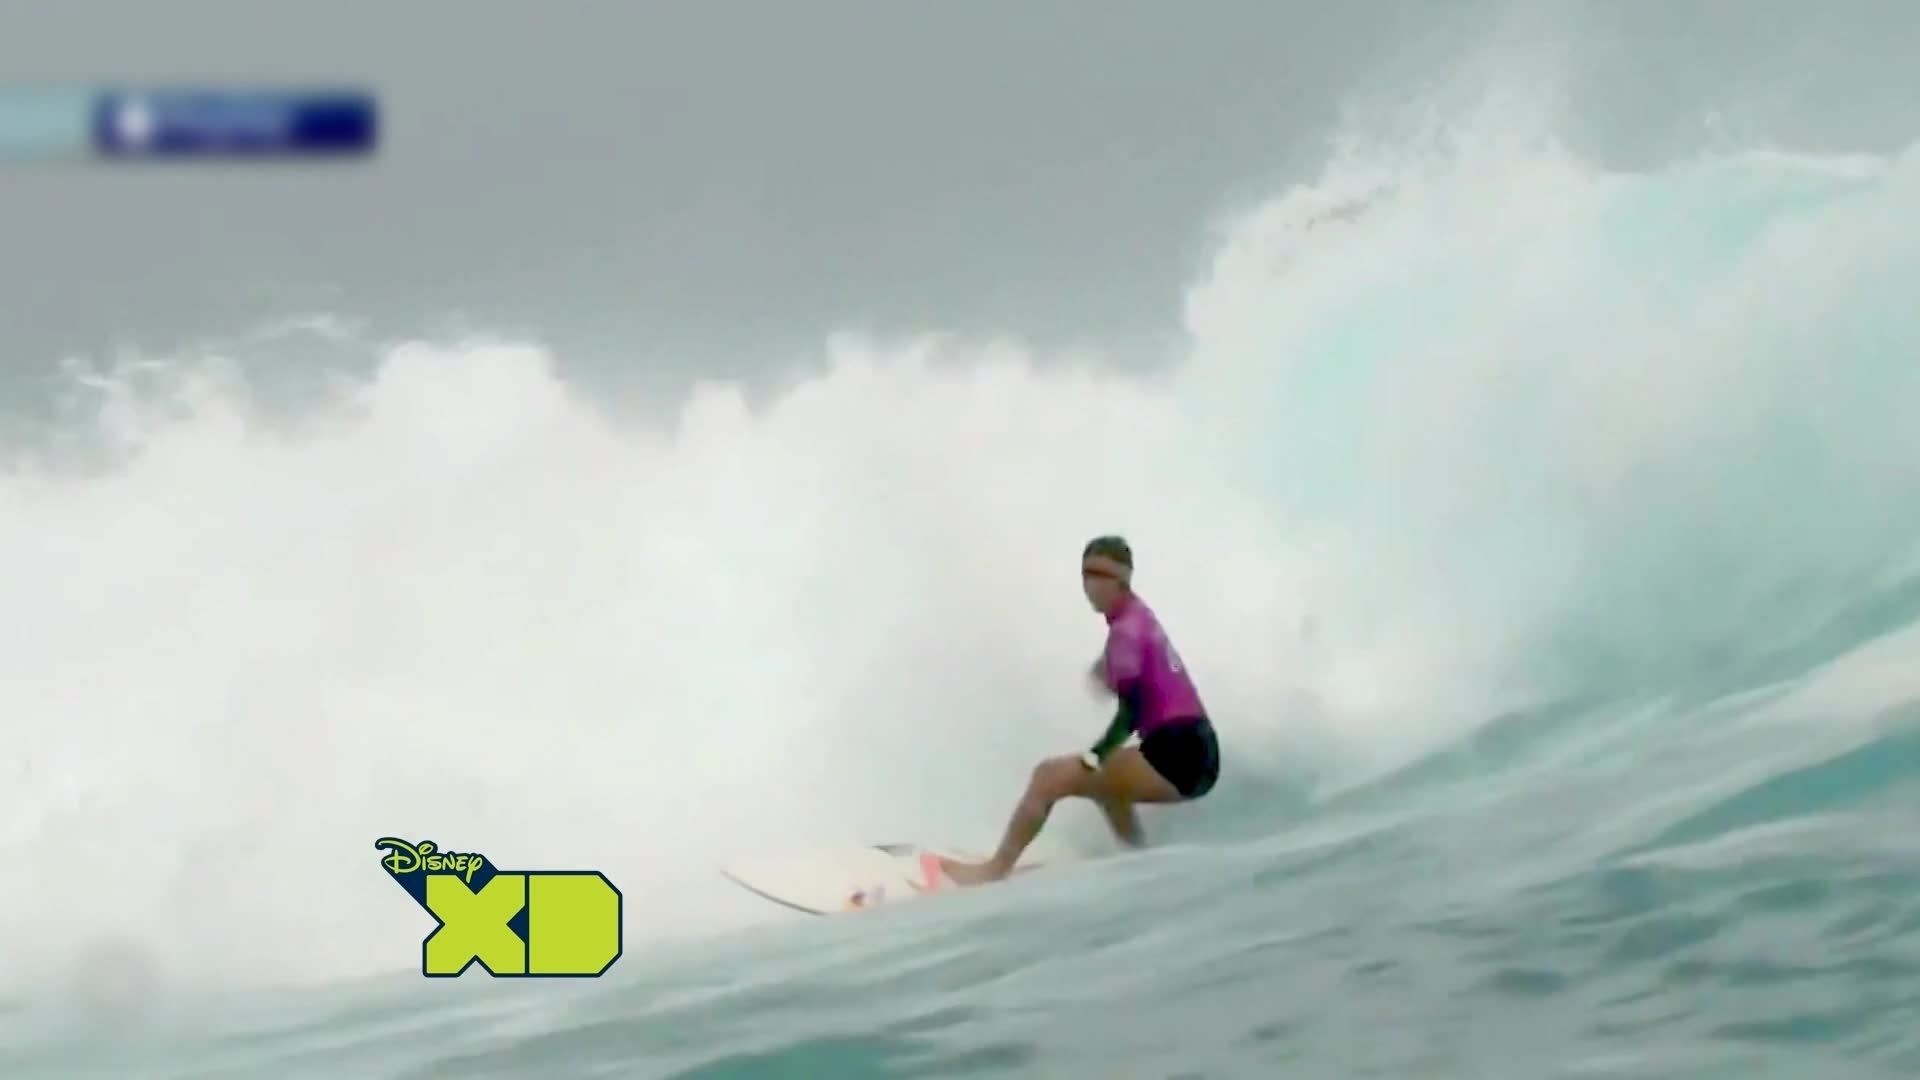 Disney XD Sport News - Surf : Fidji Women's Pro